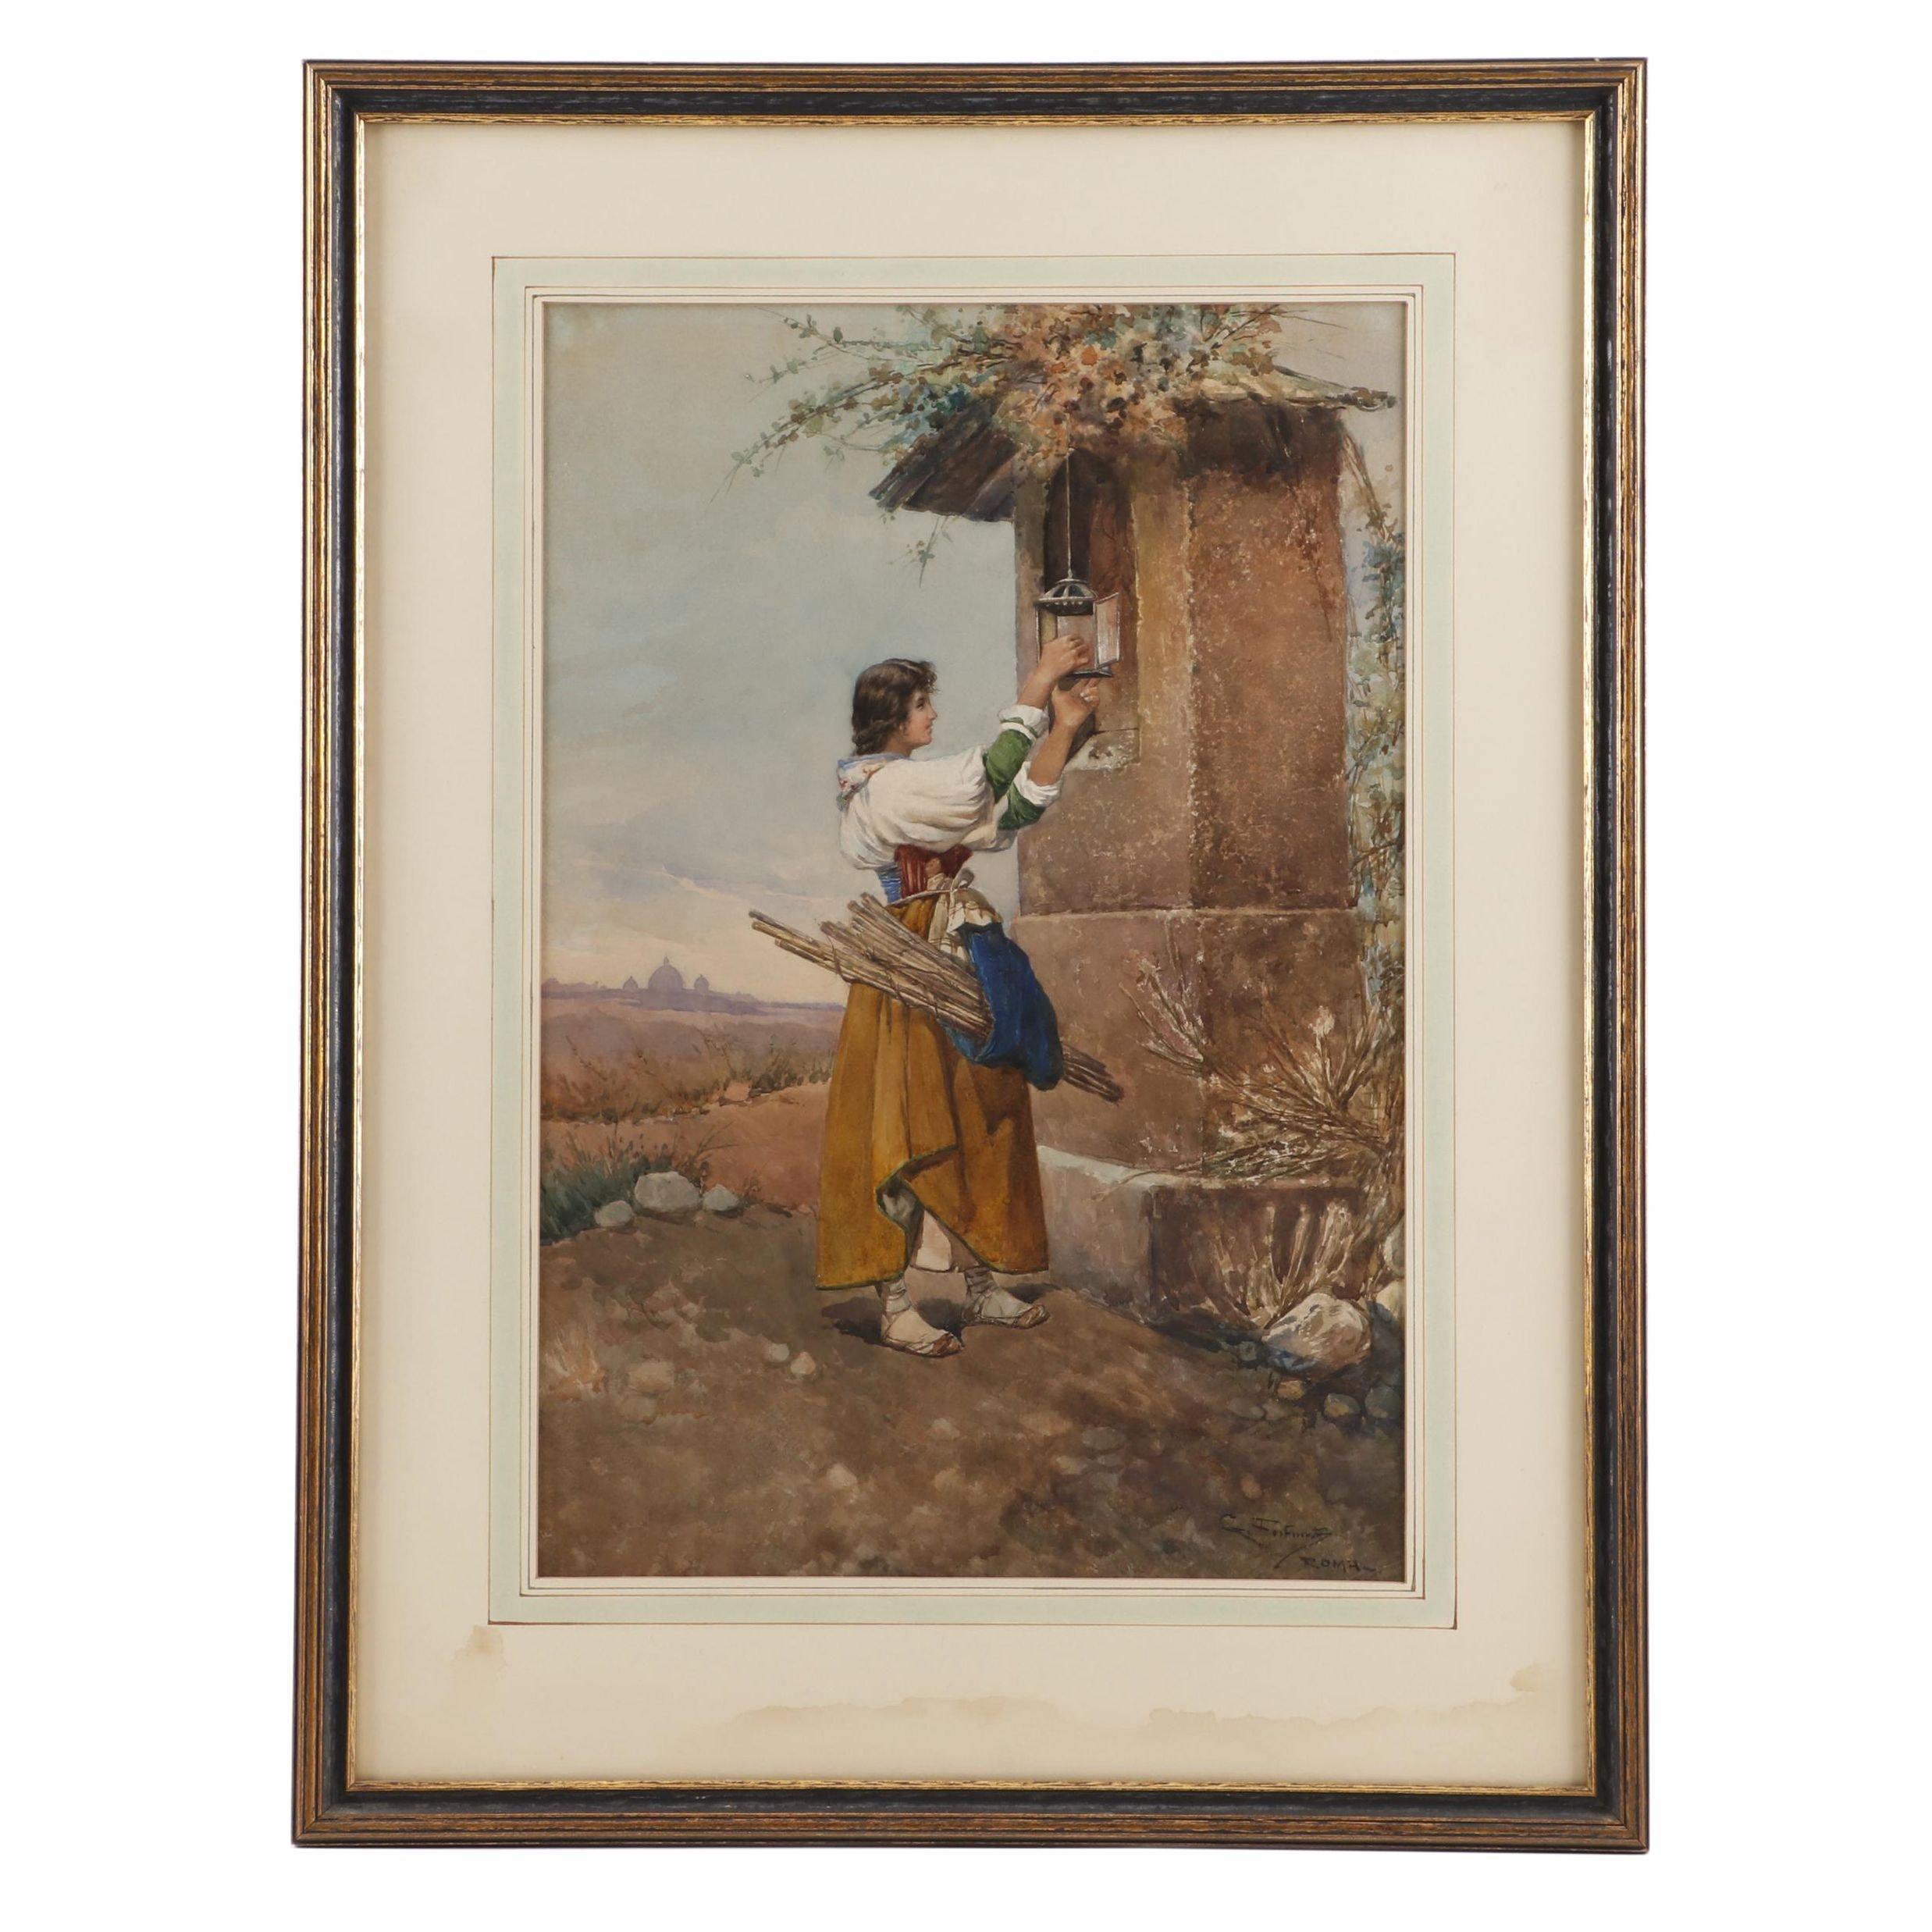 Giovanni Fortunati Pastoral Watercolor Painting